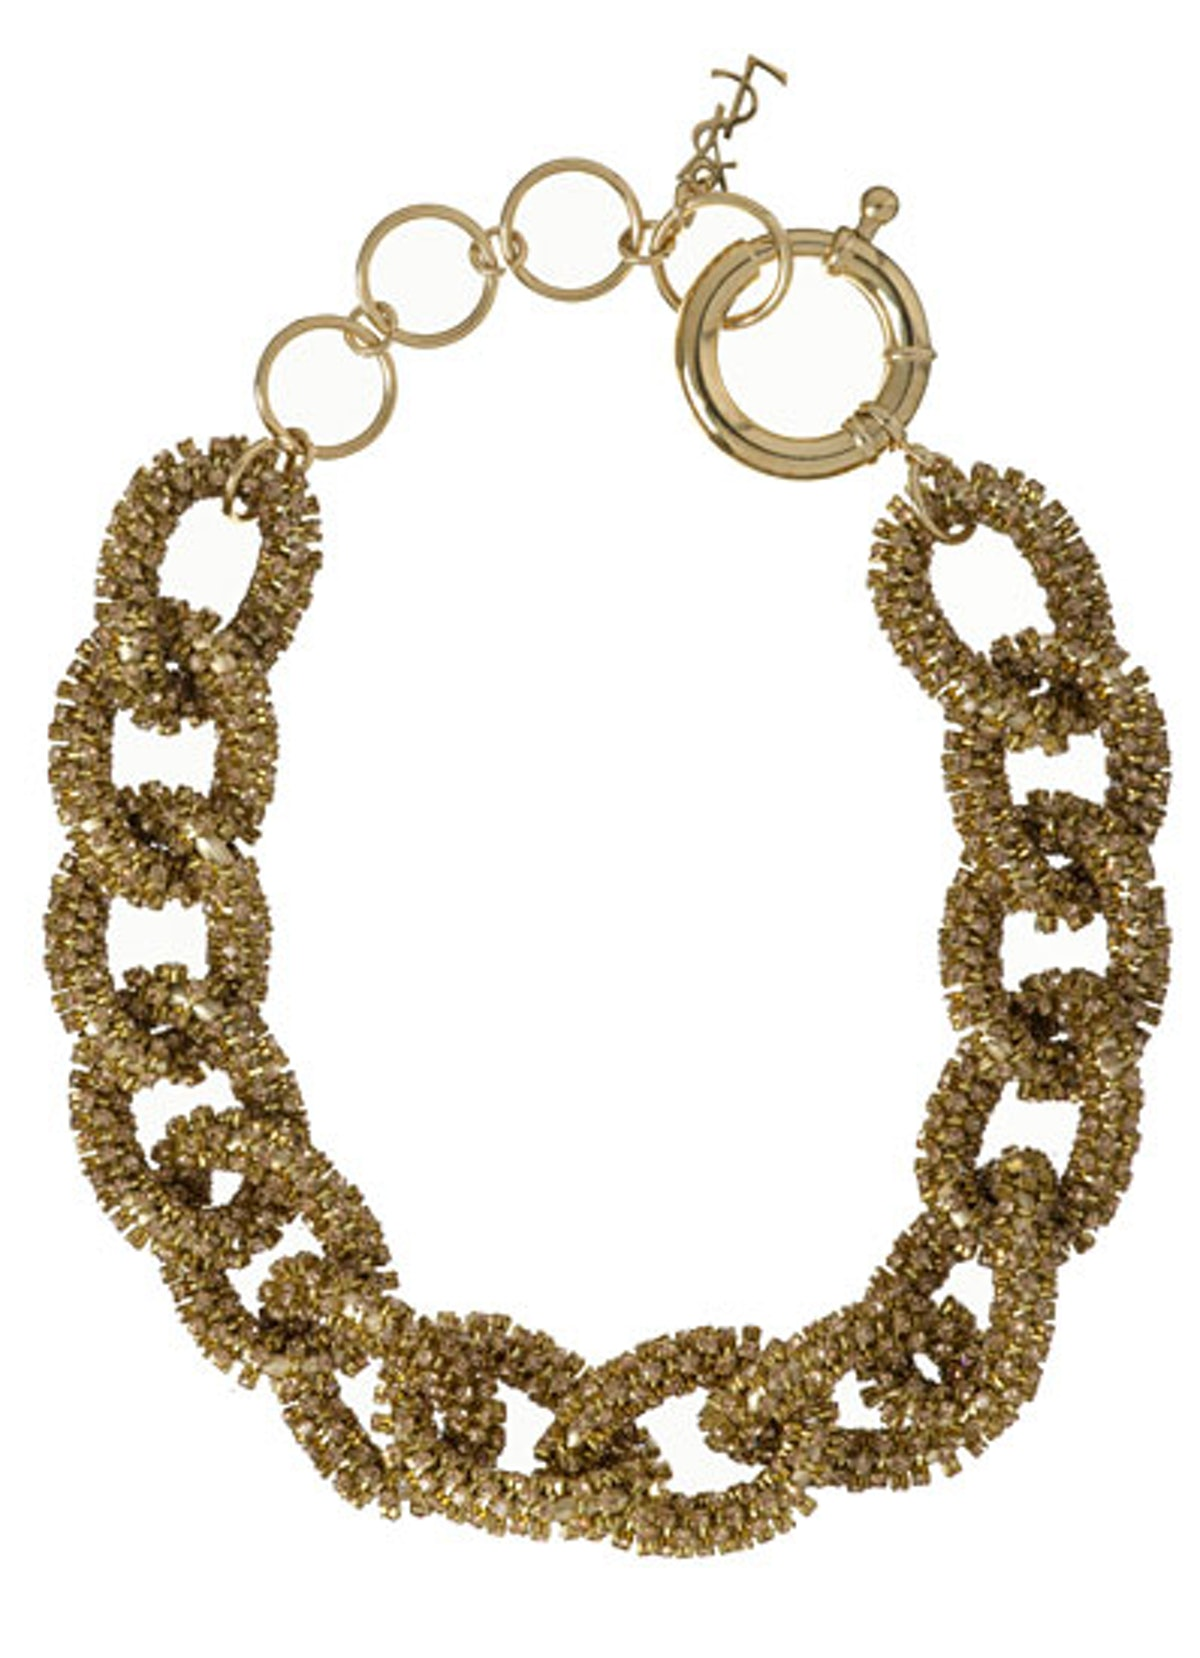 acss-gold-jewelry-08-v.jpg